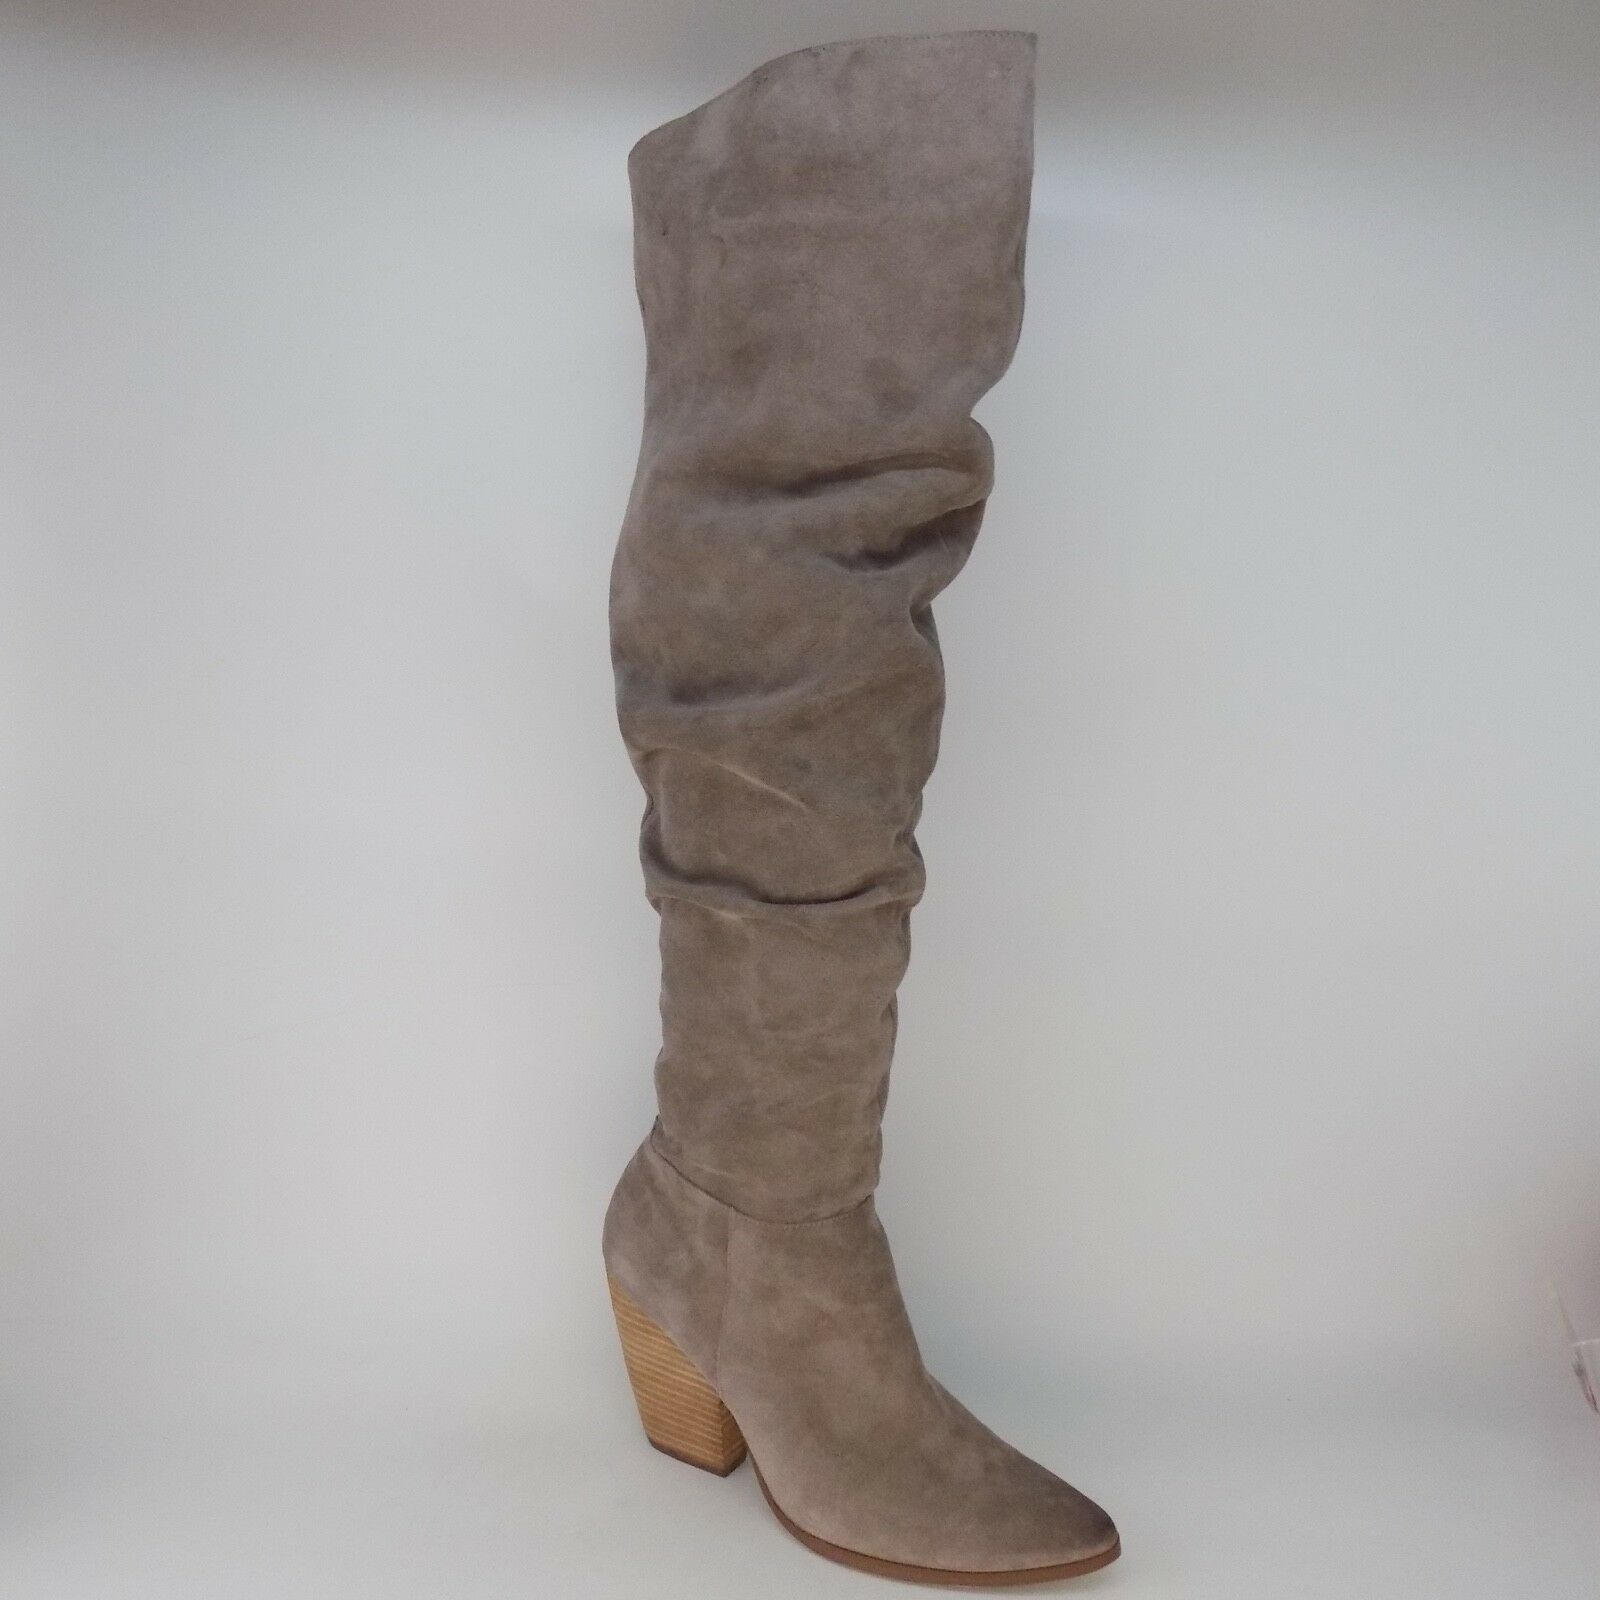 Charles by Charles David Noelle Knee High femmes bottes Taille 7.5 M AL4898